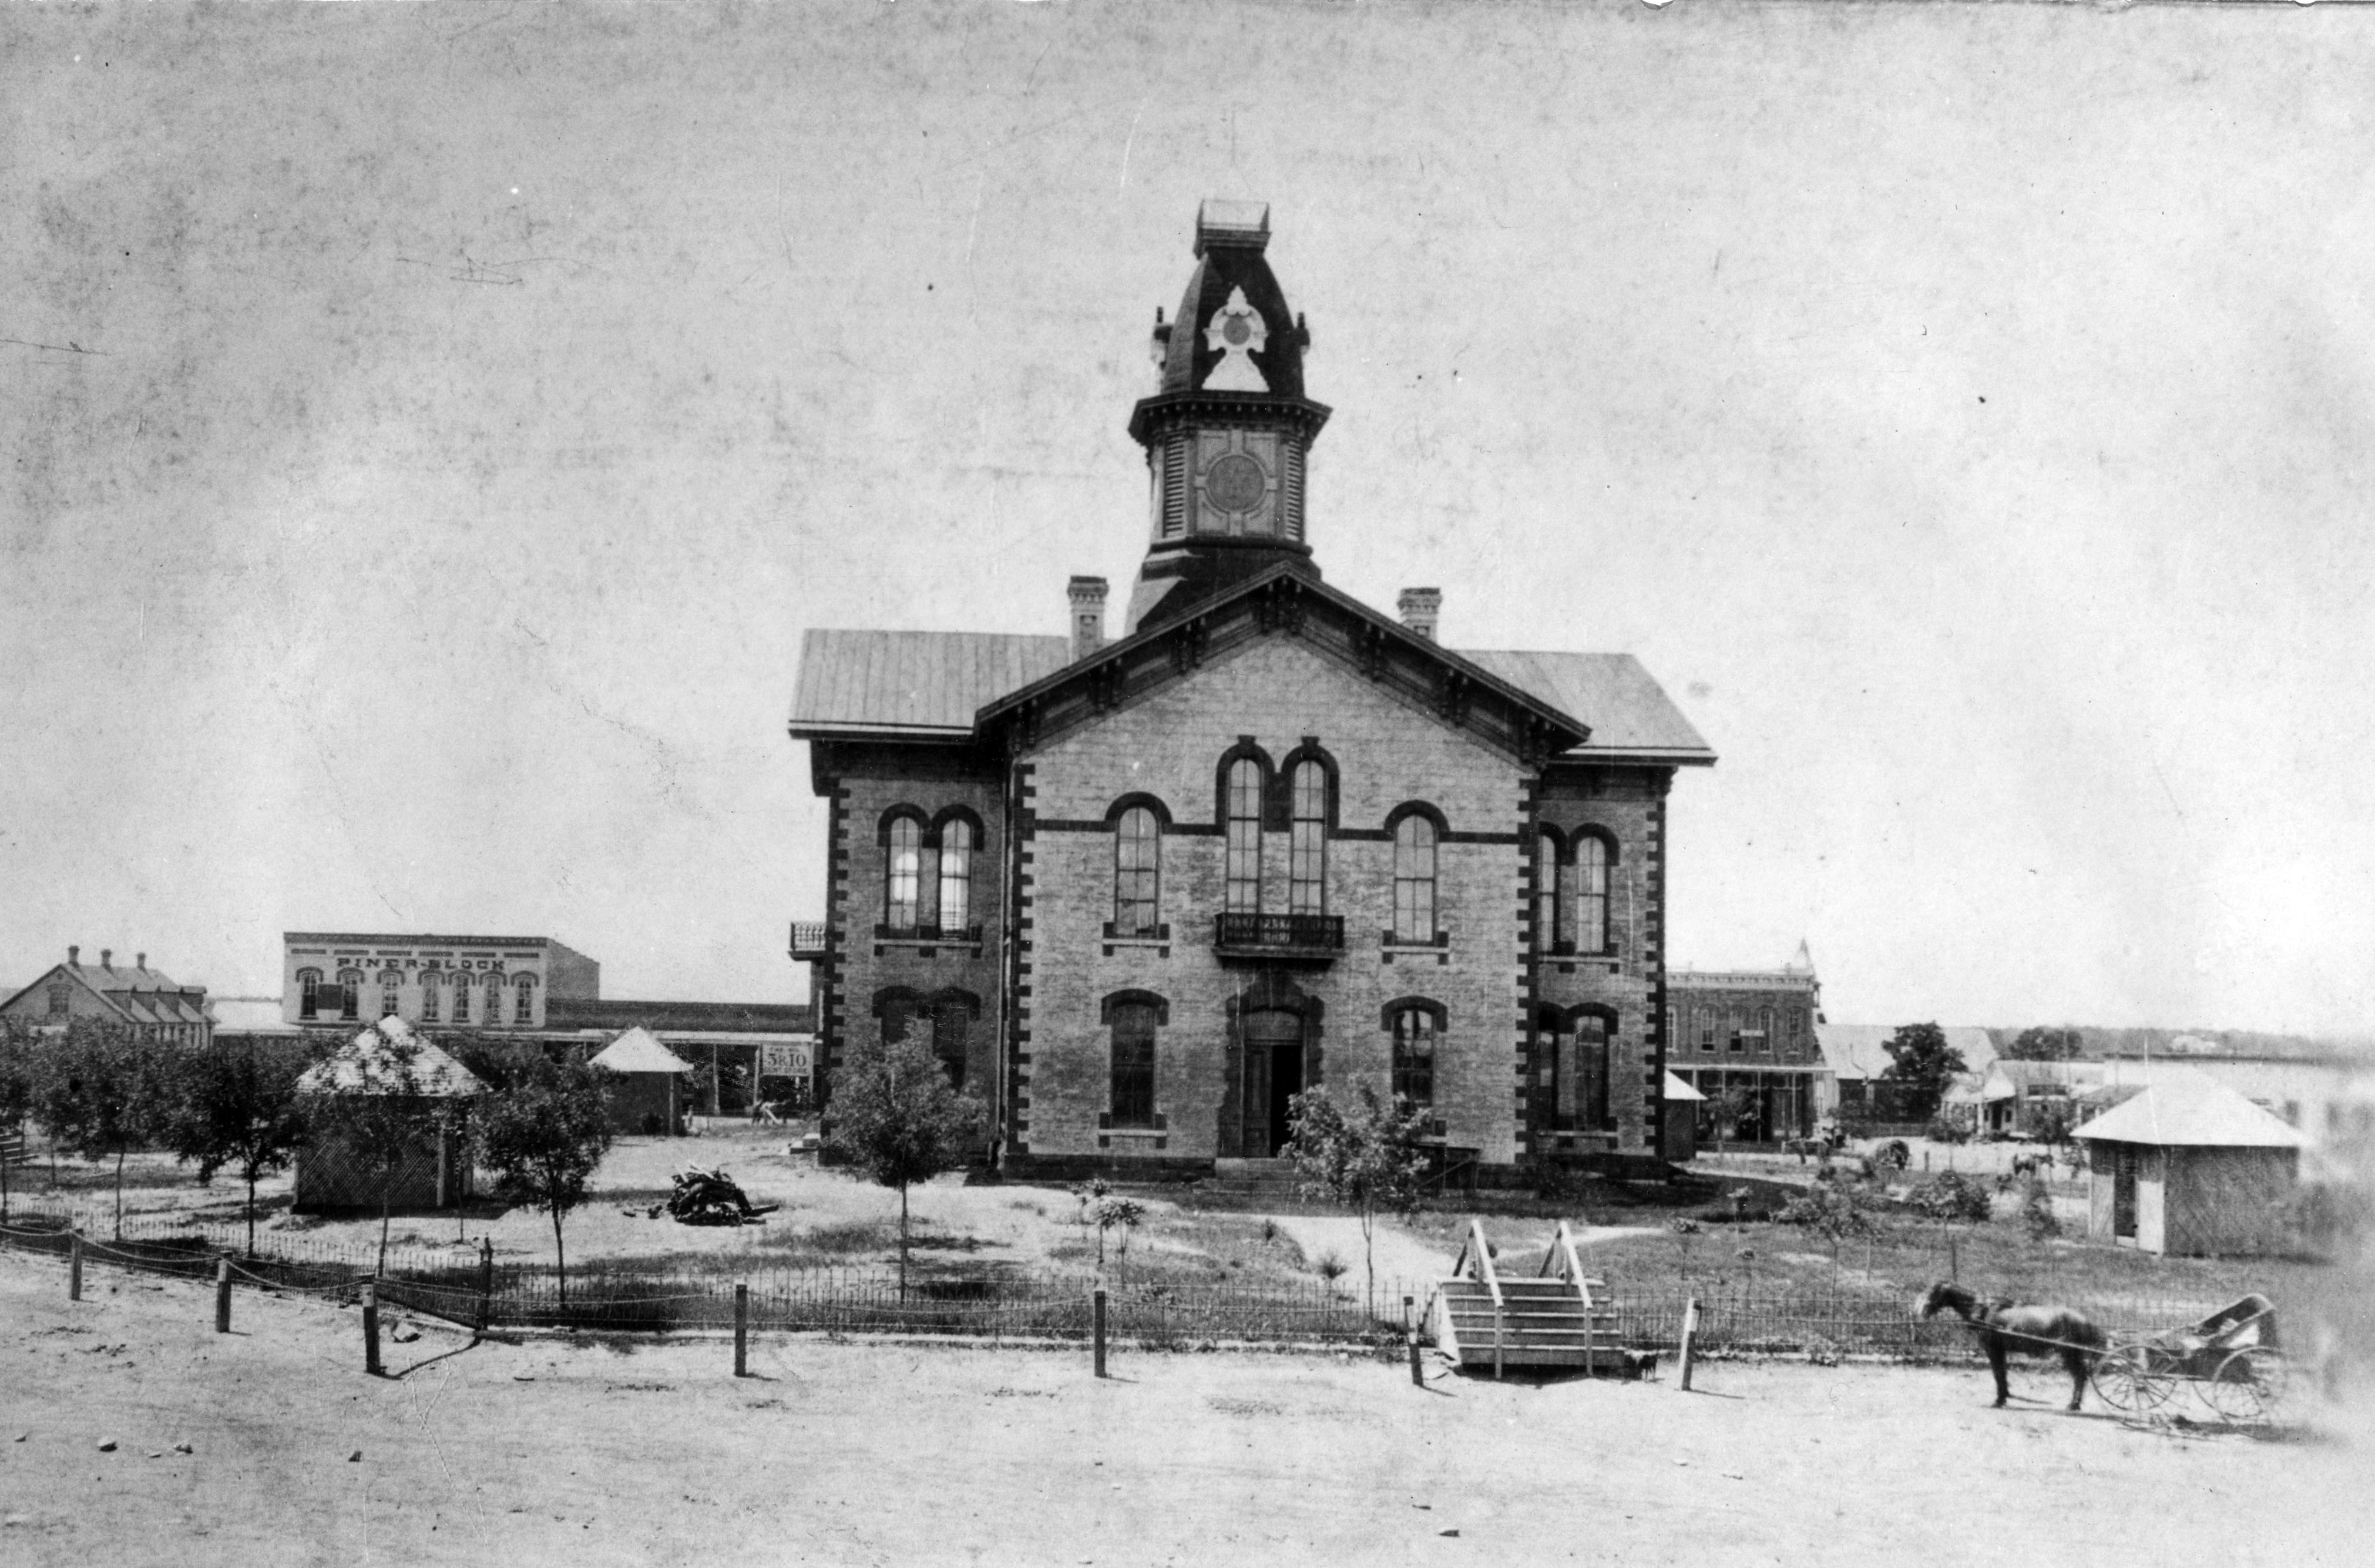 Denton County Courthouse | 125 Year Archival Retrospective